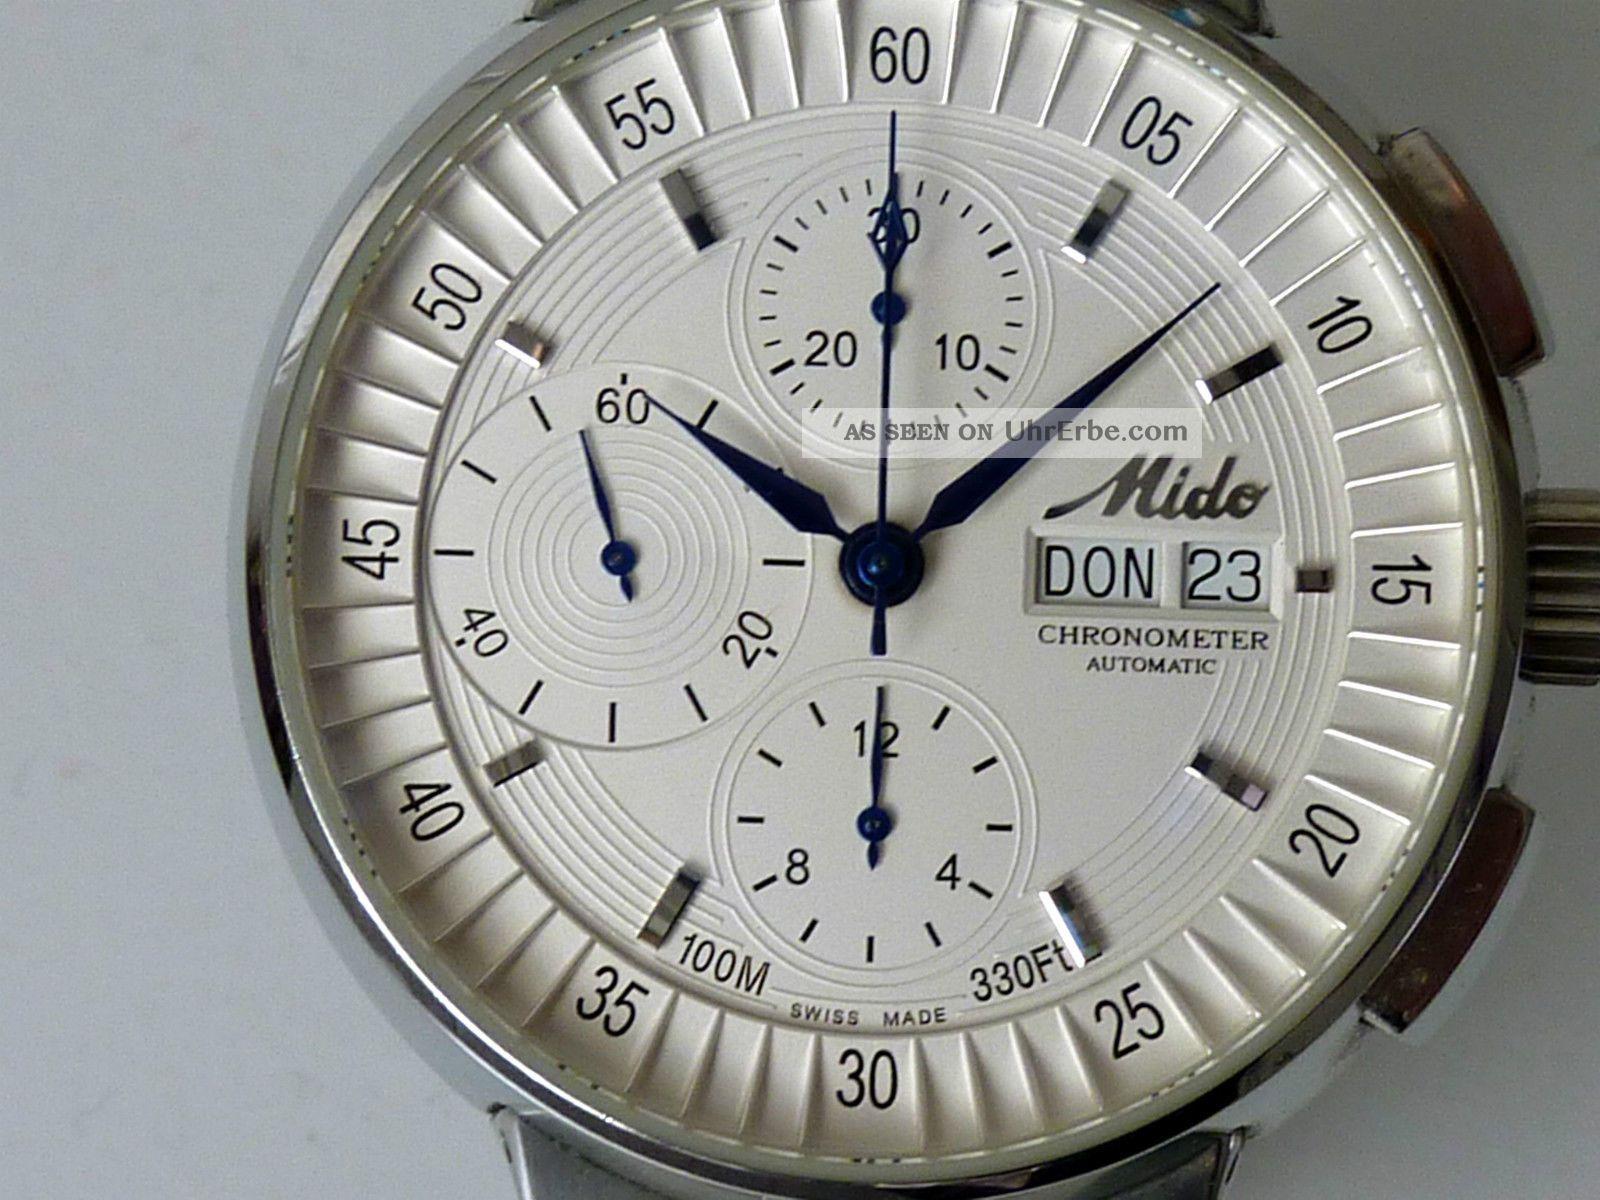 Mido All Dial Chronograph EinzelstÜck Sonderanfertigung Chronometer Mit Papiere Armbanduhren Bild